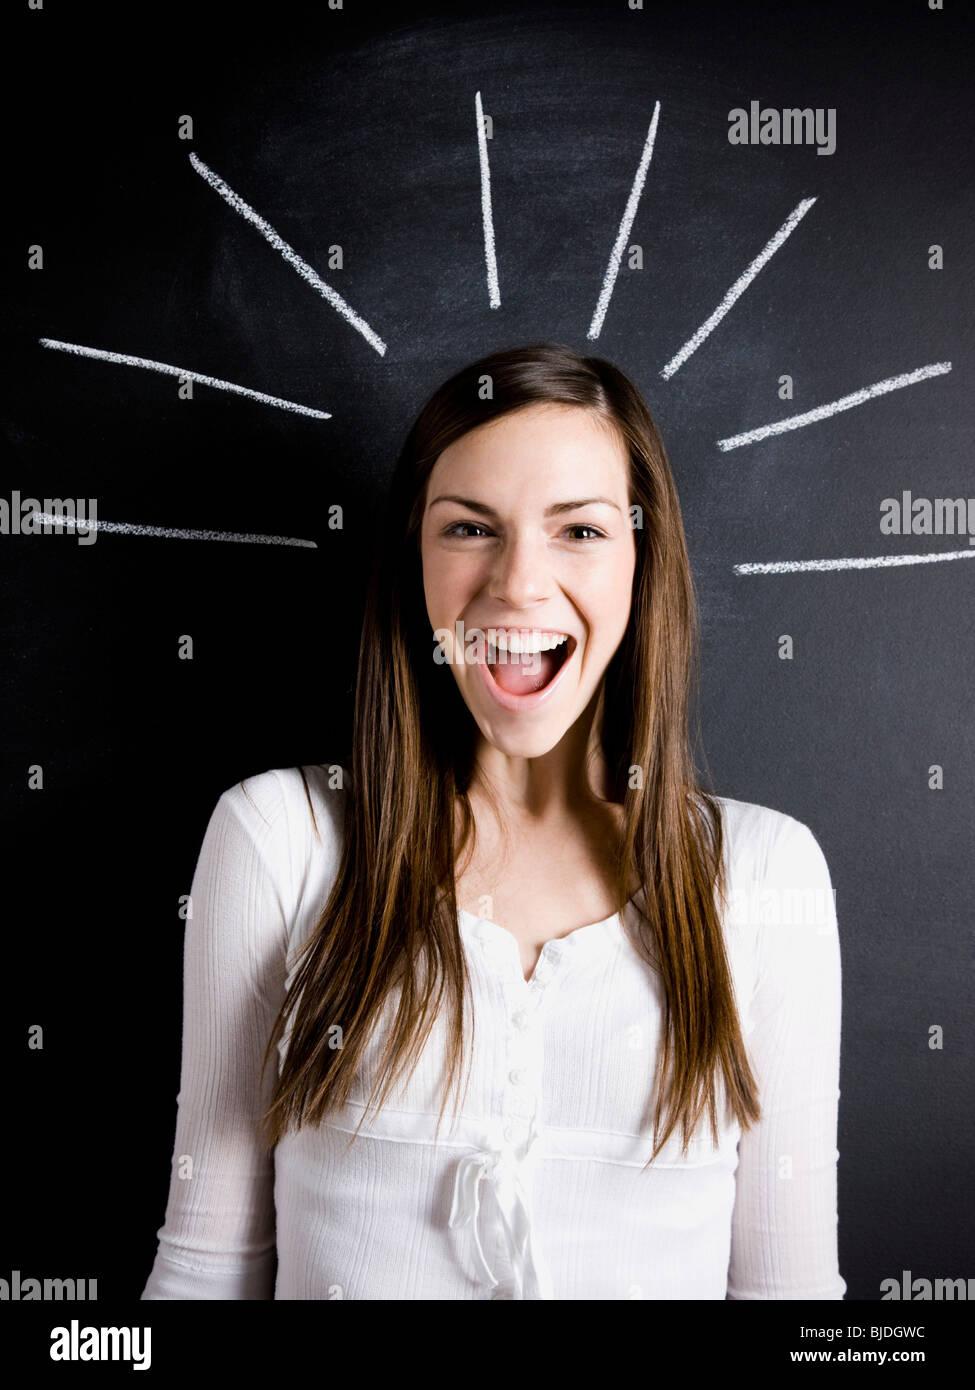 Jeune femme contre une ardoise Photo Stock